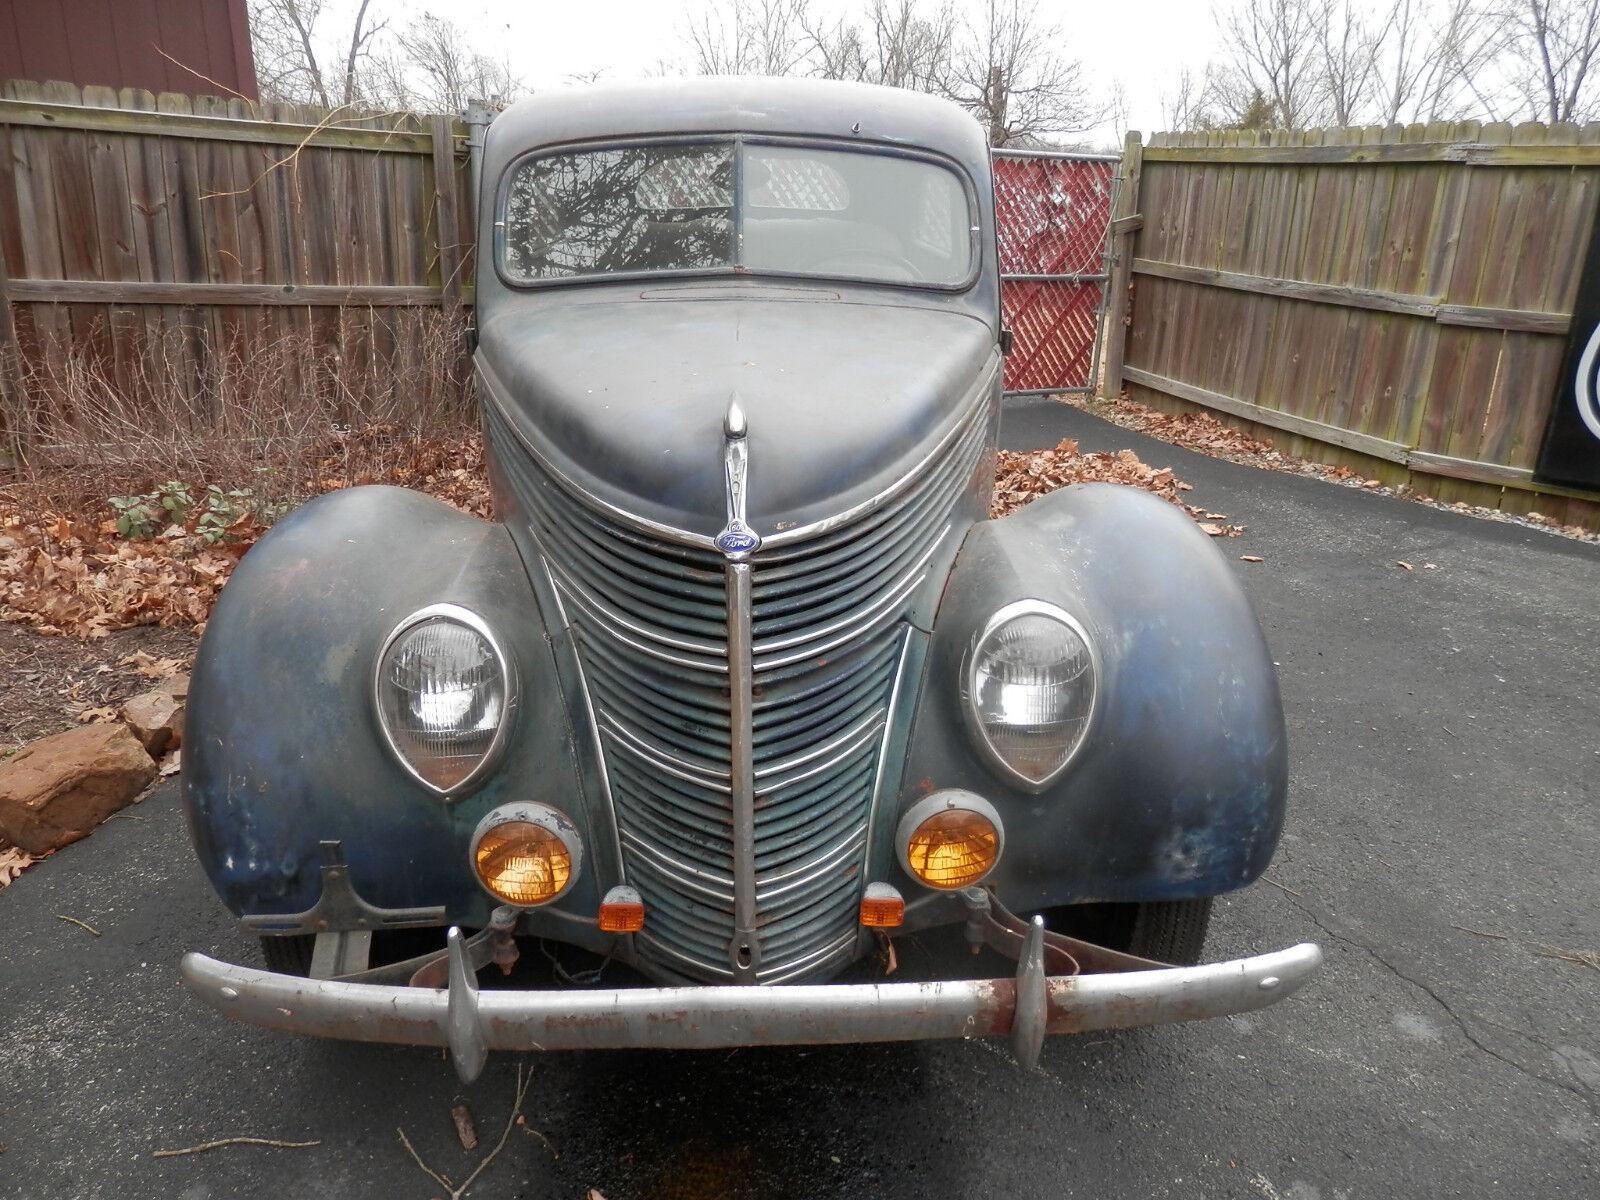 1938 Ford 2 DOOR SEDAN HOT ROD 1938 FORD BARN FIND HOT ROD STREET ROD CUSTOM CLASSIC FLATHEAD ENGINE NO RAT